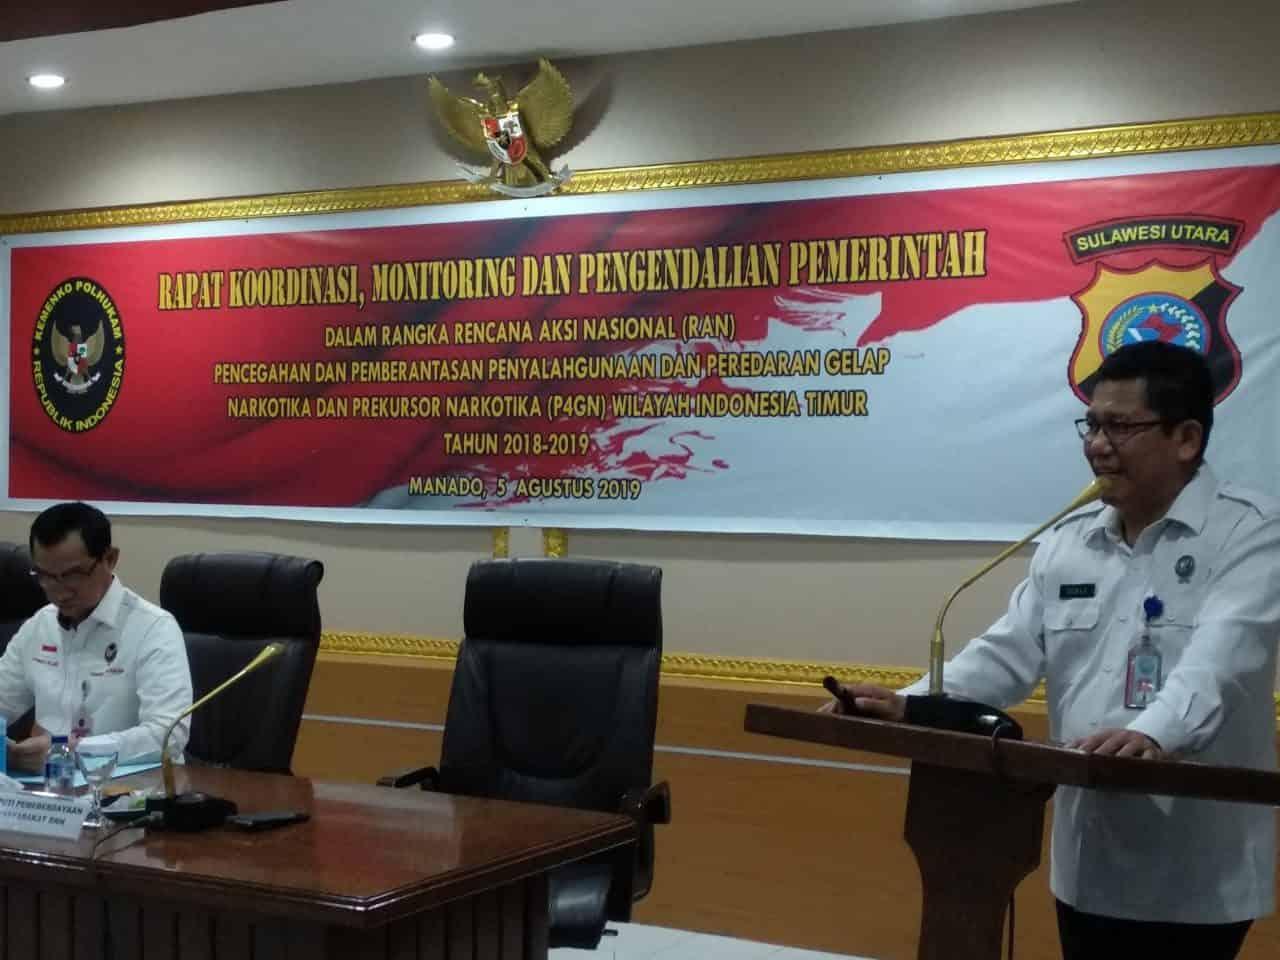 Rapat Koordinasi Pengendalian Rencana Aksi Nasional (RAN) P4GN Wilayah Indonesia Timur